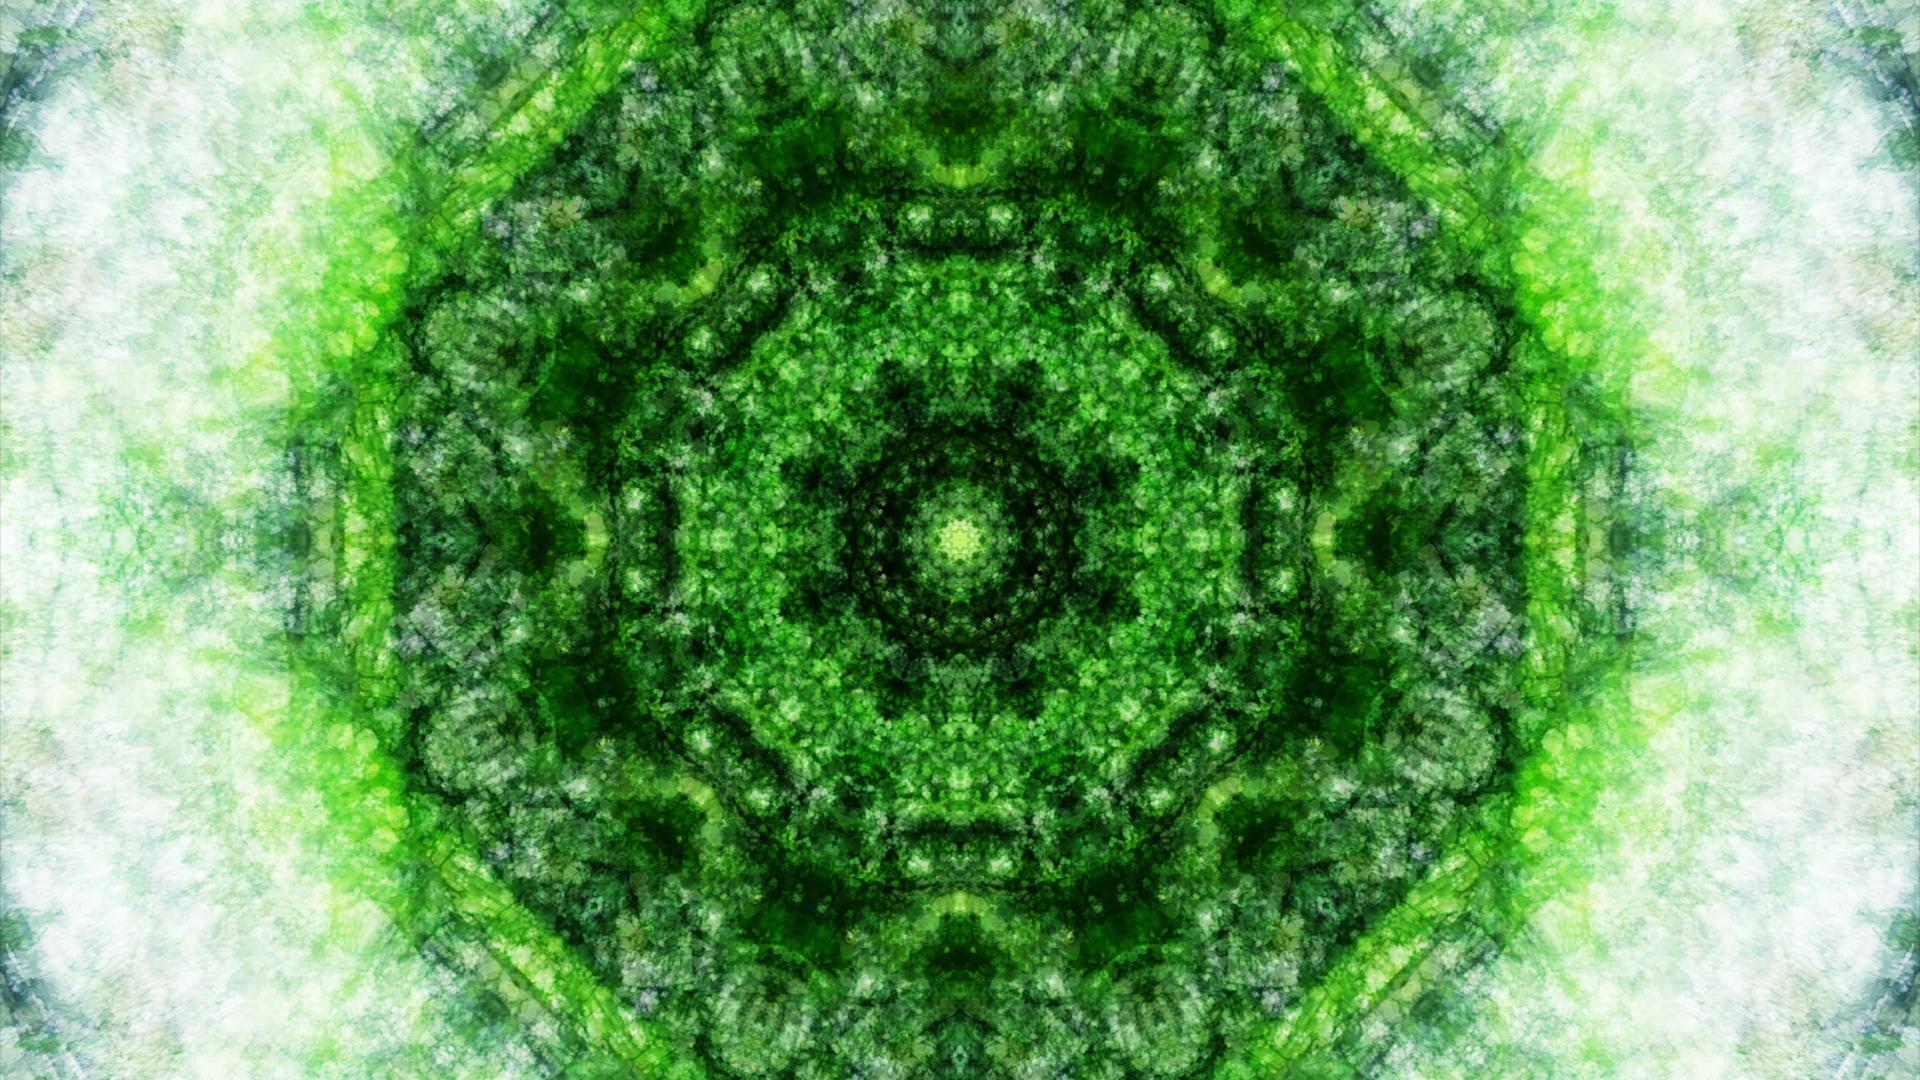 Emitting Velocity - Mohican Forest by Matt Swift Still 2